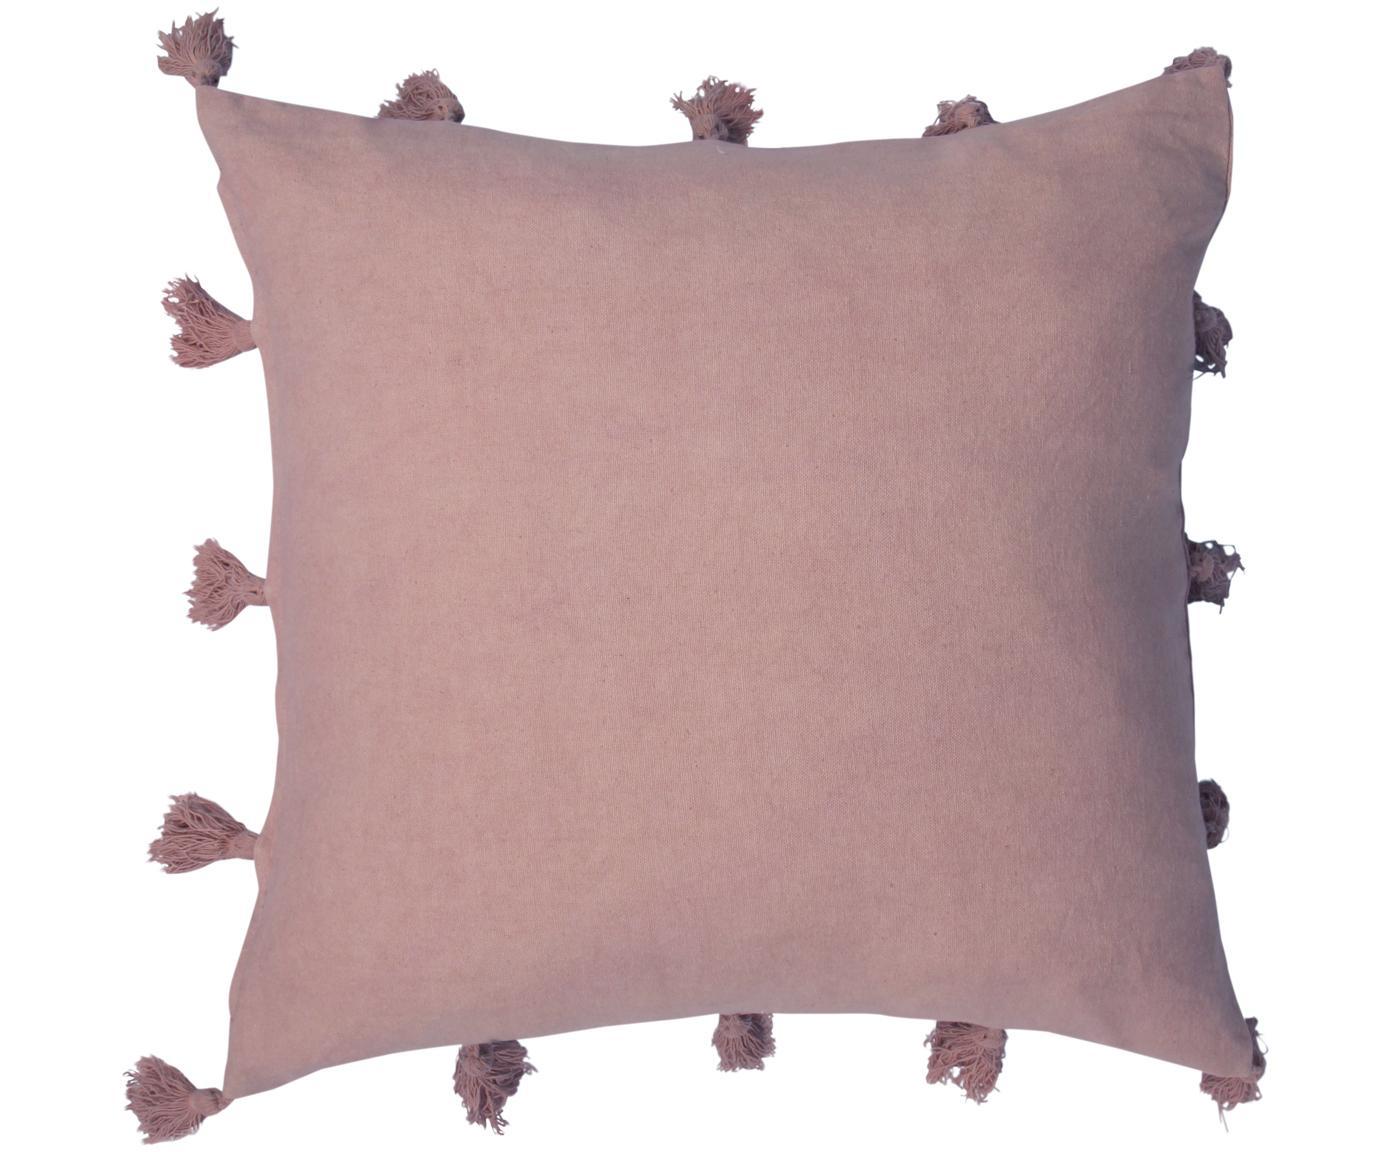 Kissenhülle Bonita mit Quasten, Bezug: 100% Baumwolle, Terrakotta, 45 x 45 cm